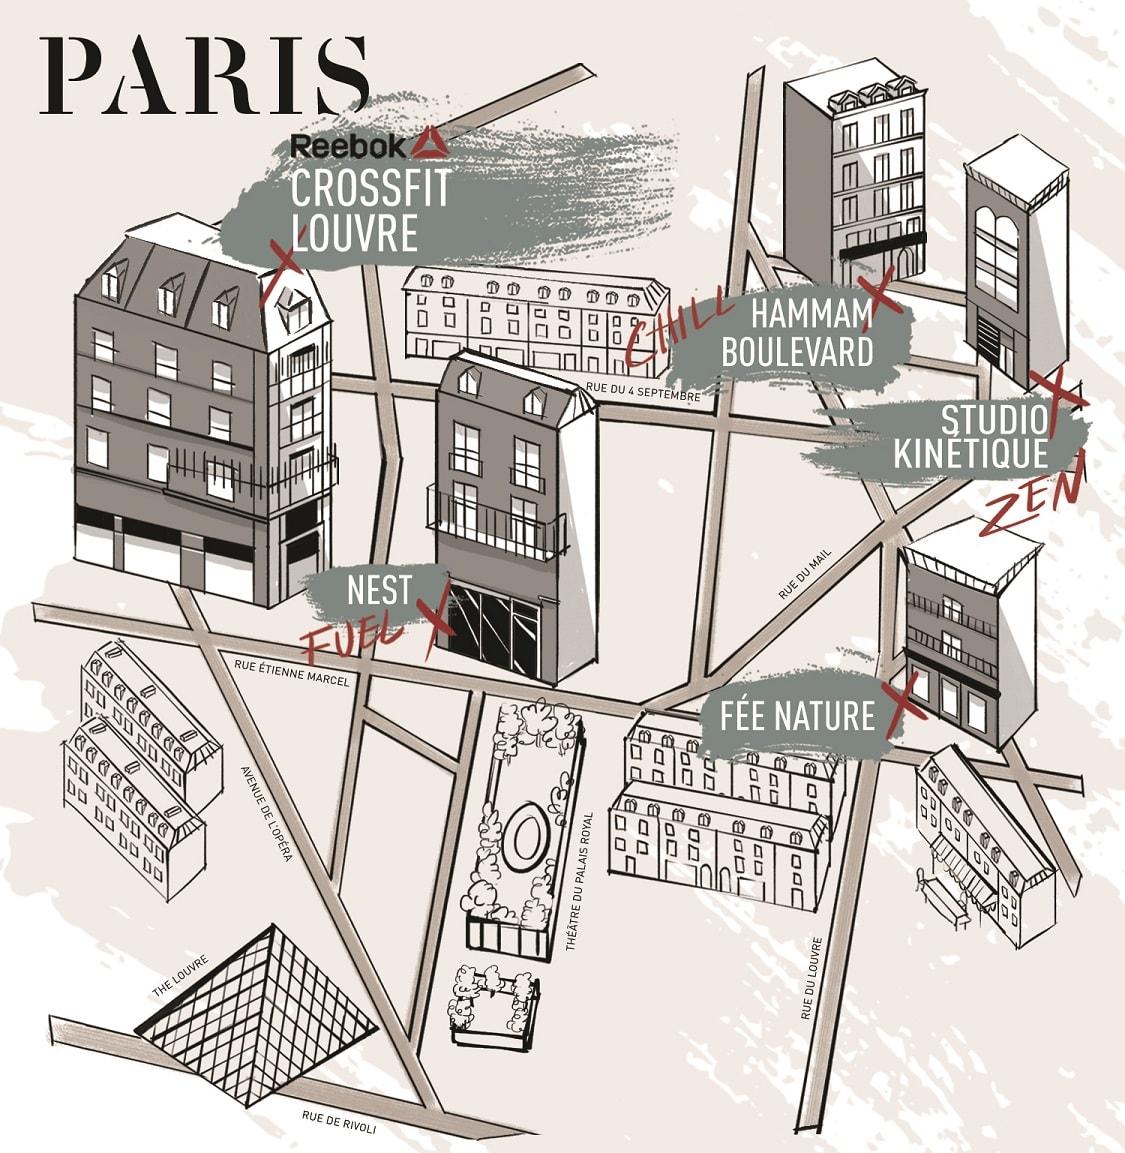 cf-travel-map-16-paris